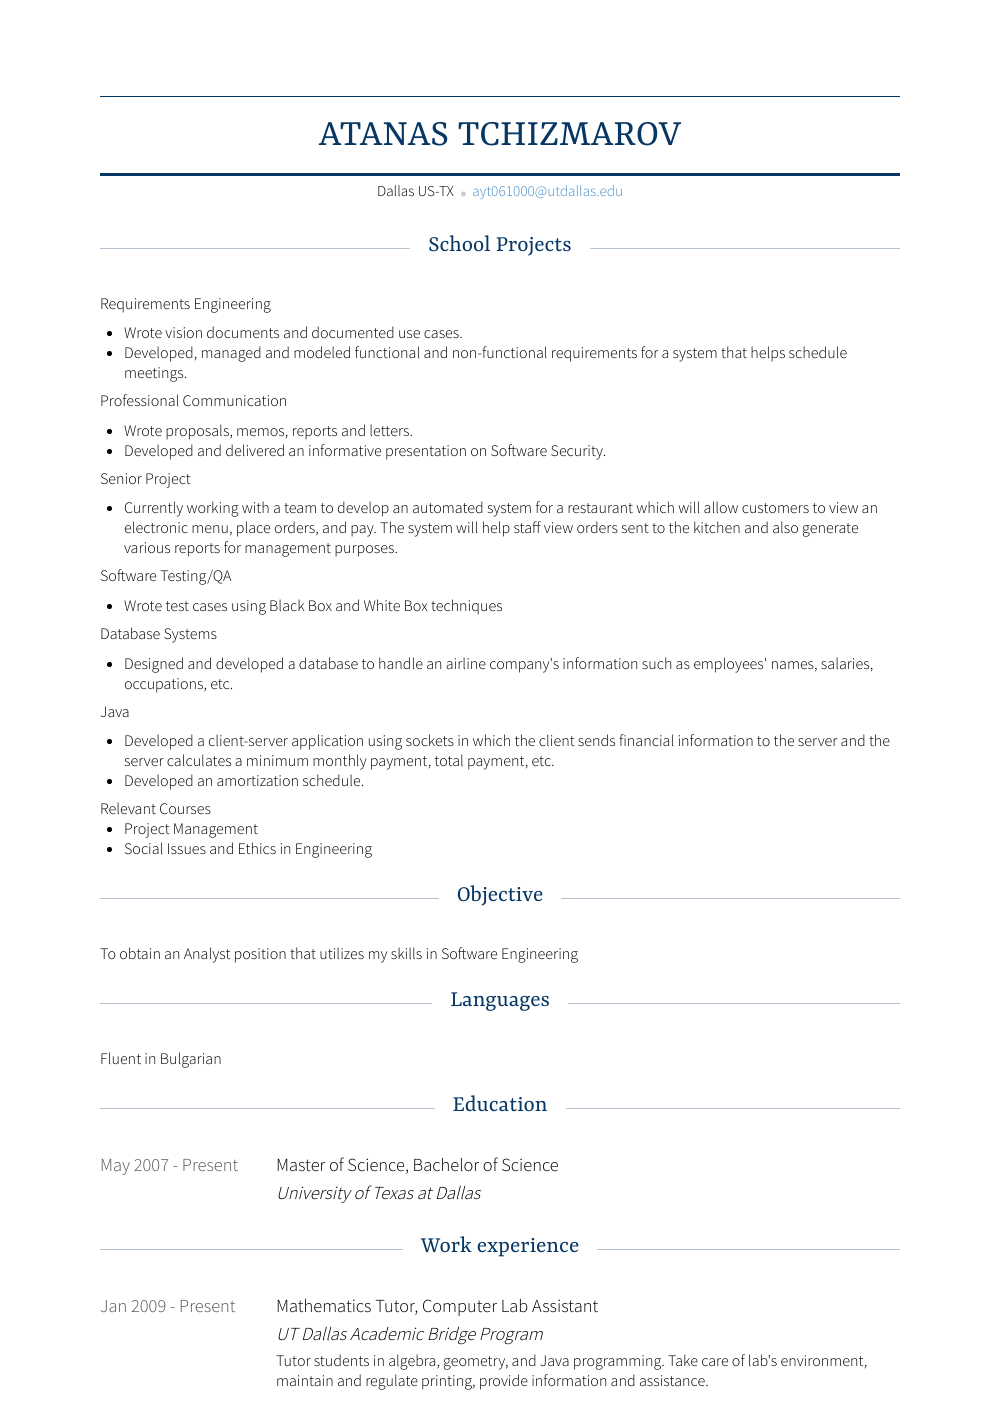 Mathematics Tutor Resume Sample